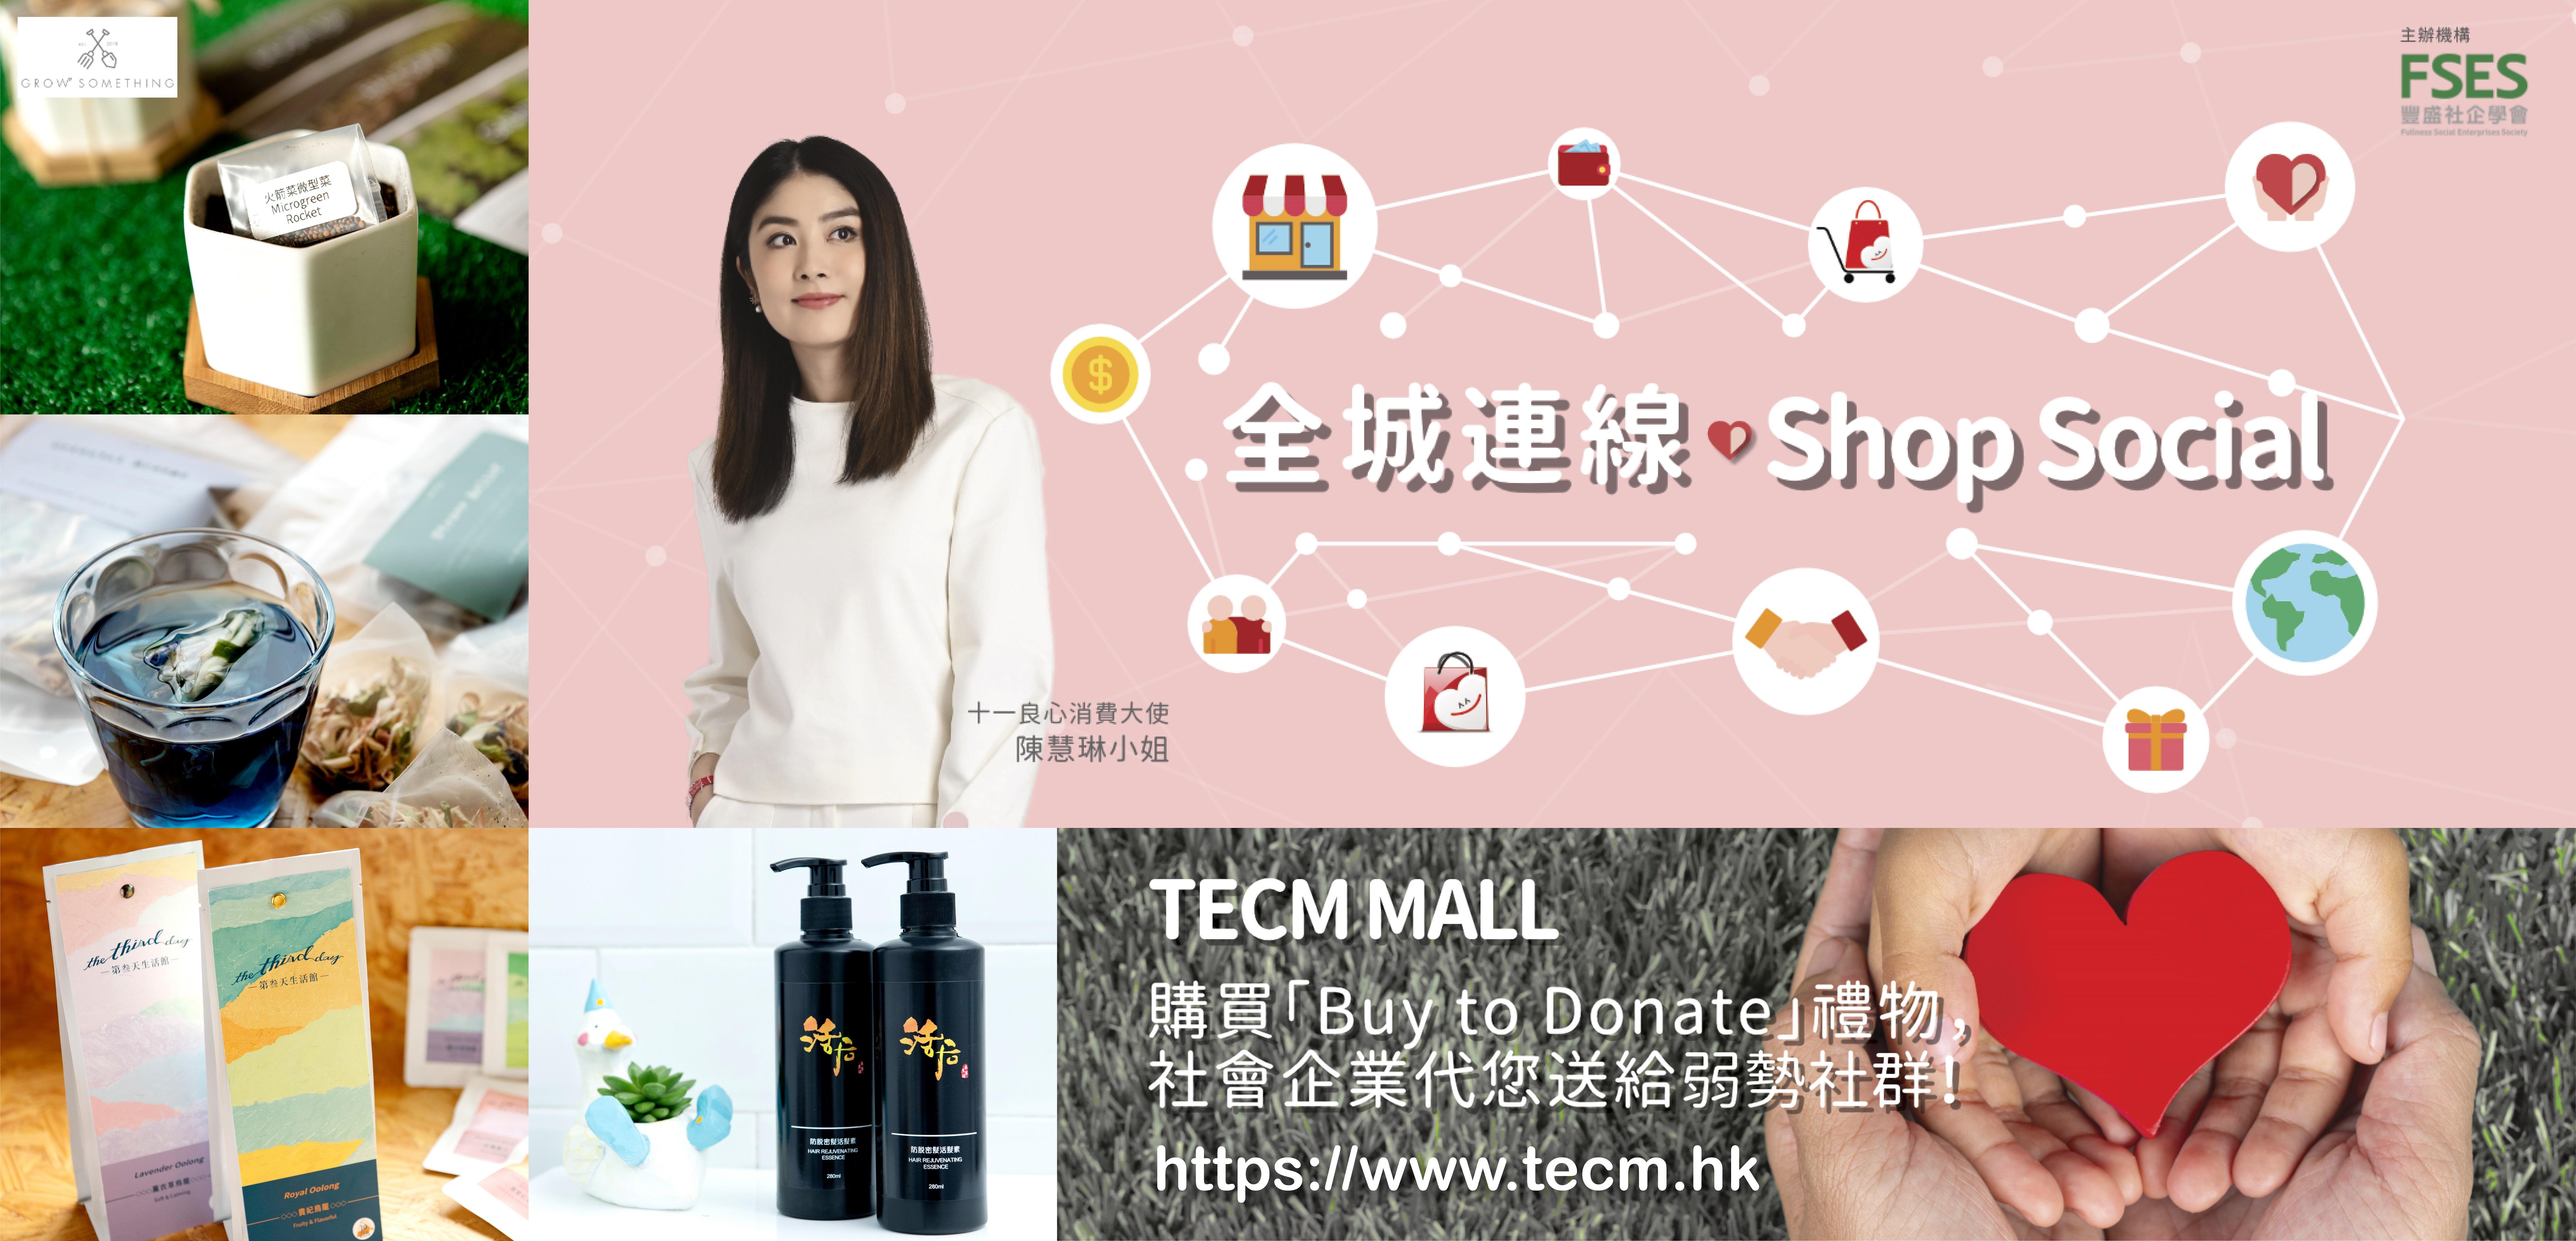 Tithe Ethical Consumption Movement 2021: Shop Social on the enhanced TECM MALL